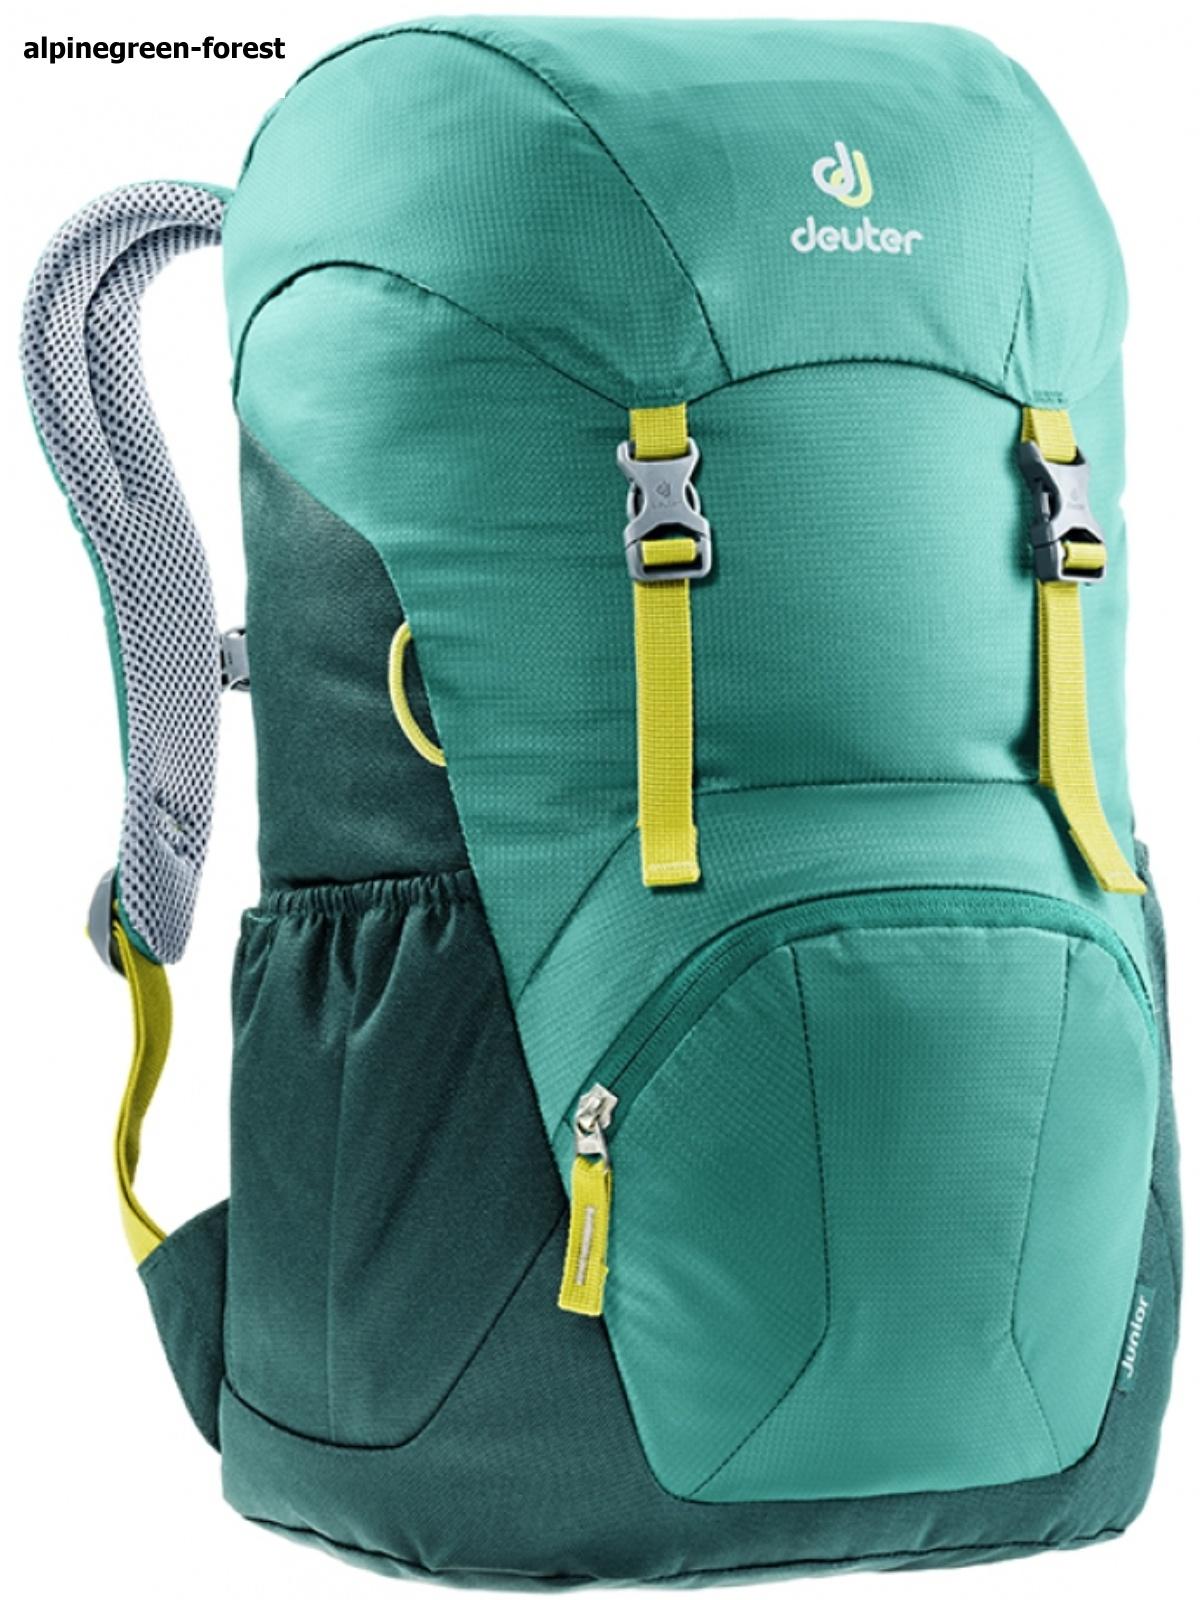 Dětský batoh DEUTER Junior 18 l - alpinegreen-forest